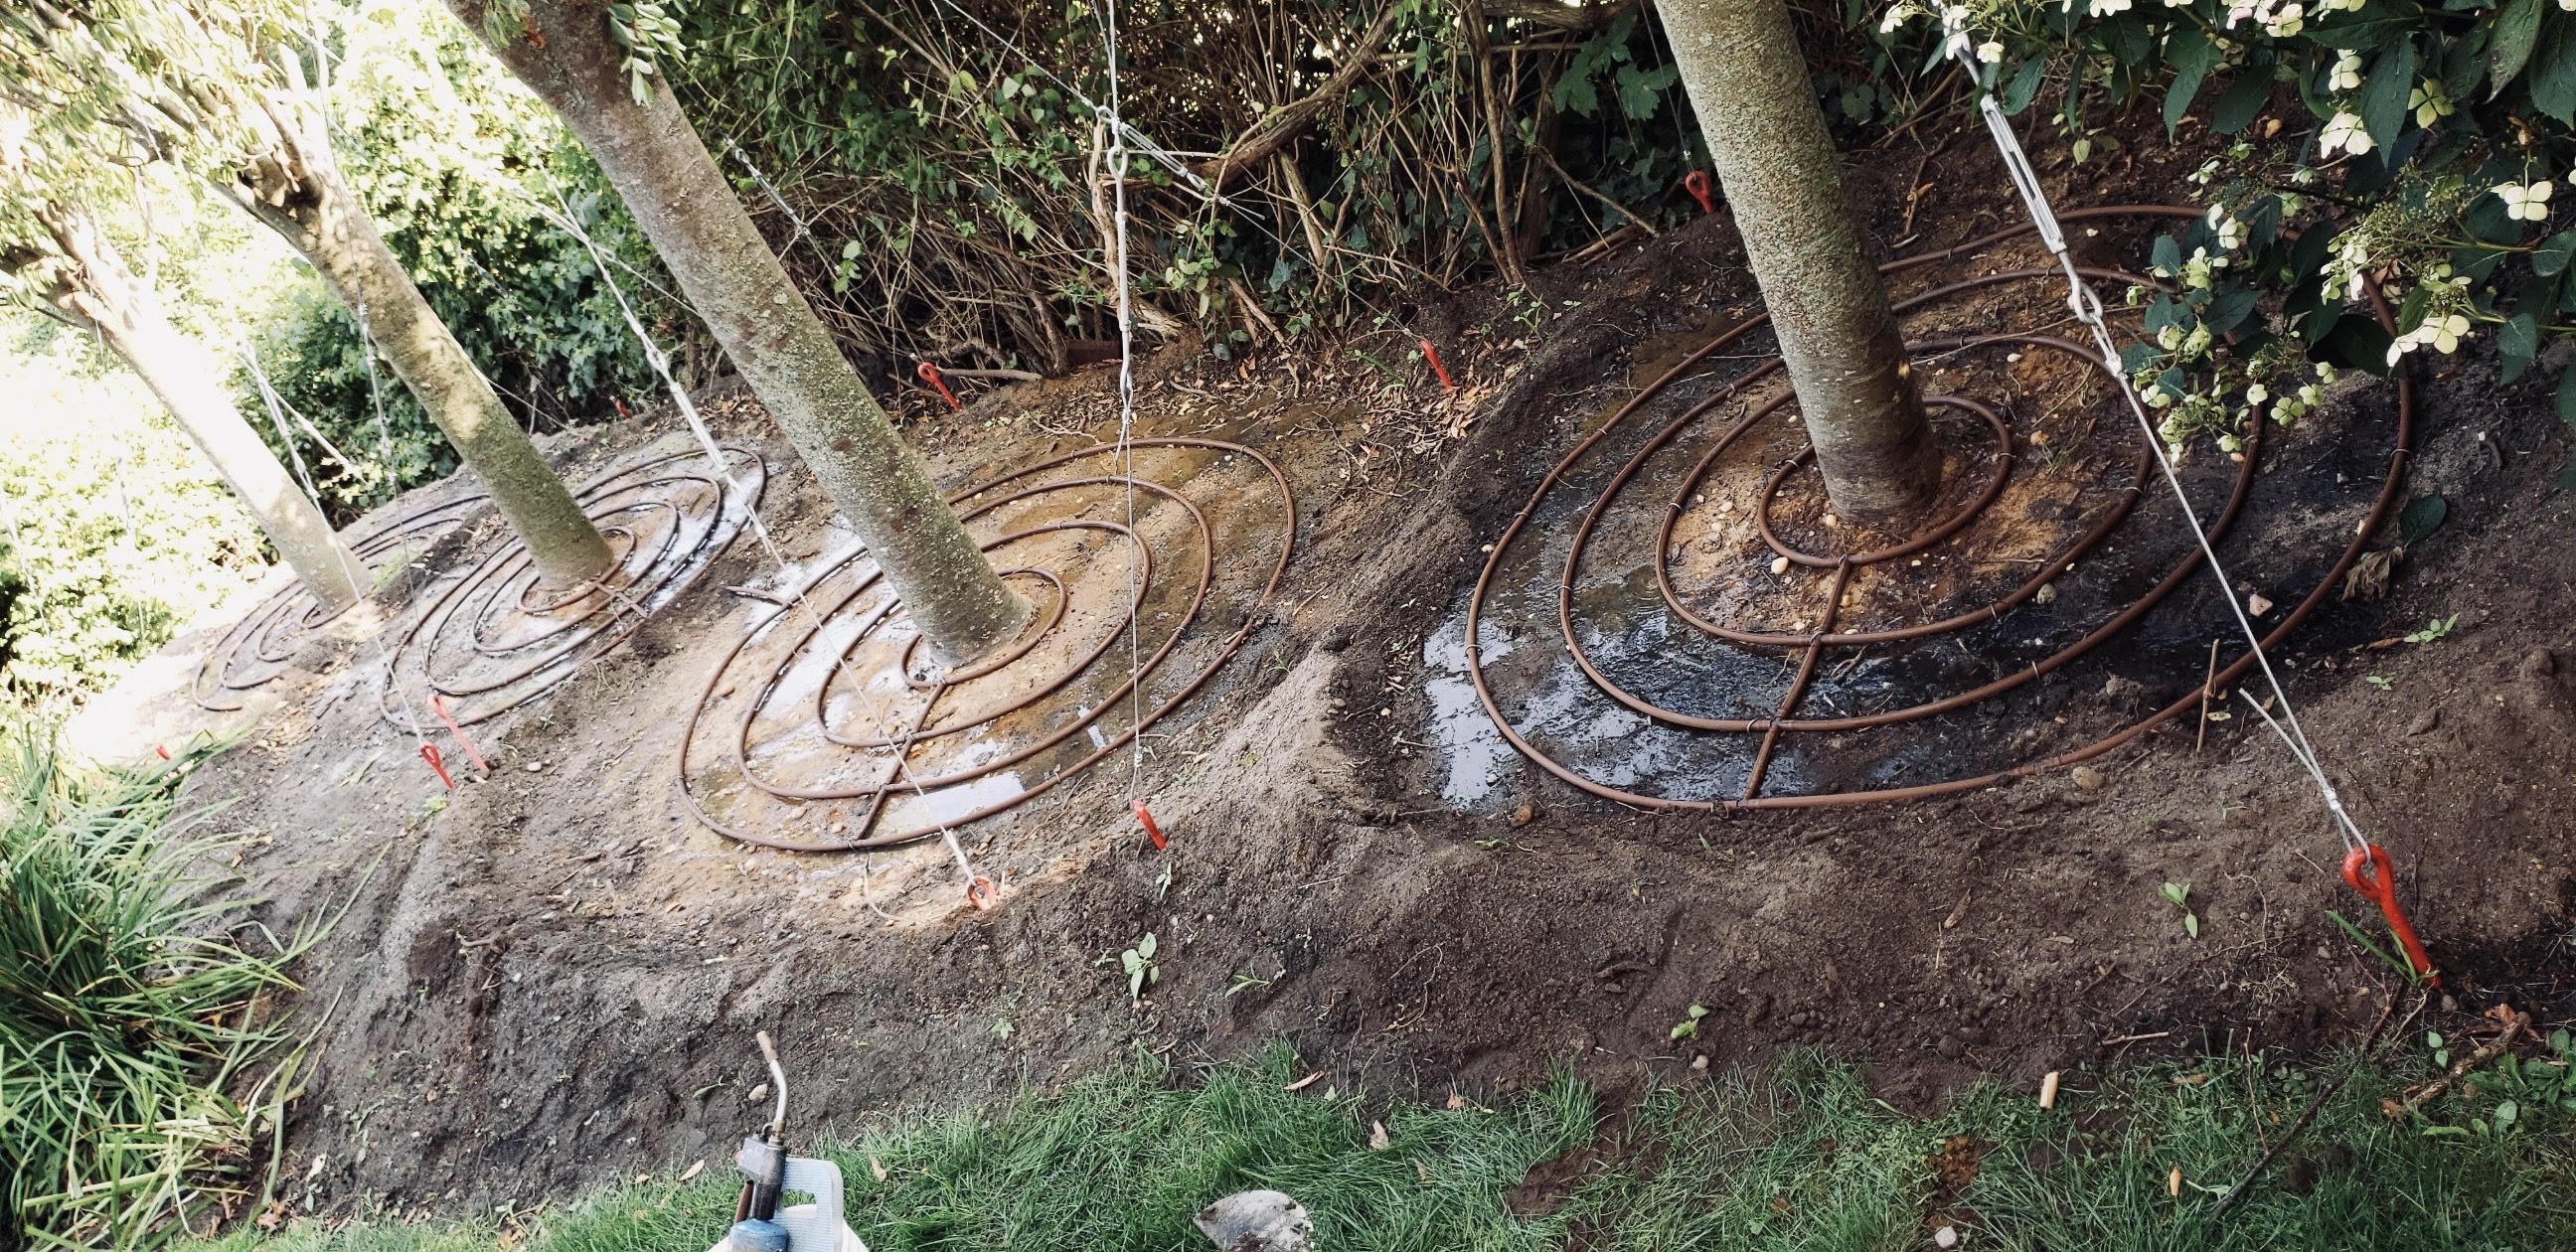 Mike Santos Irrigation - Irrigation Ringed Drip Install